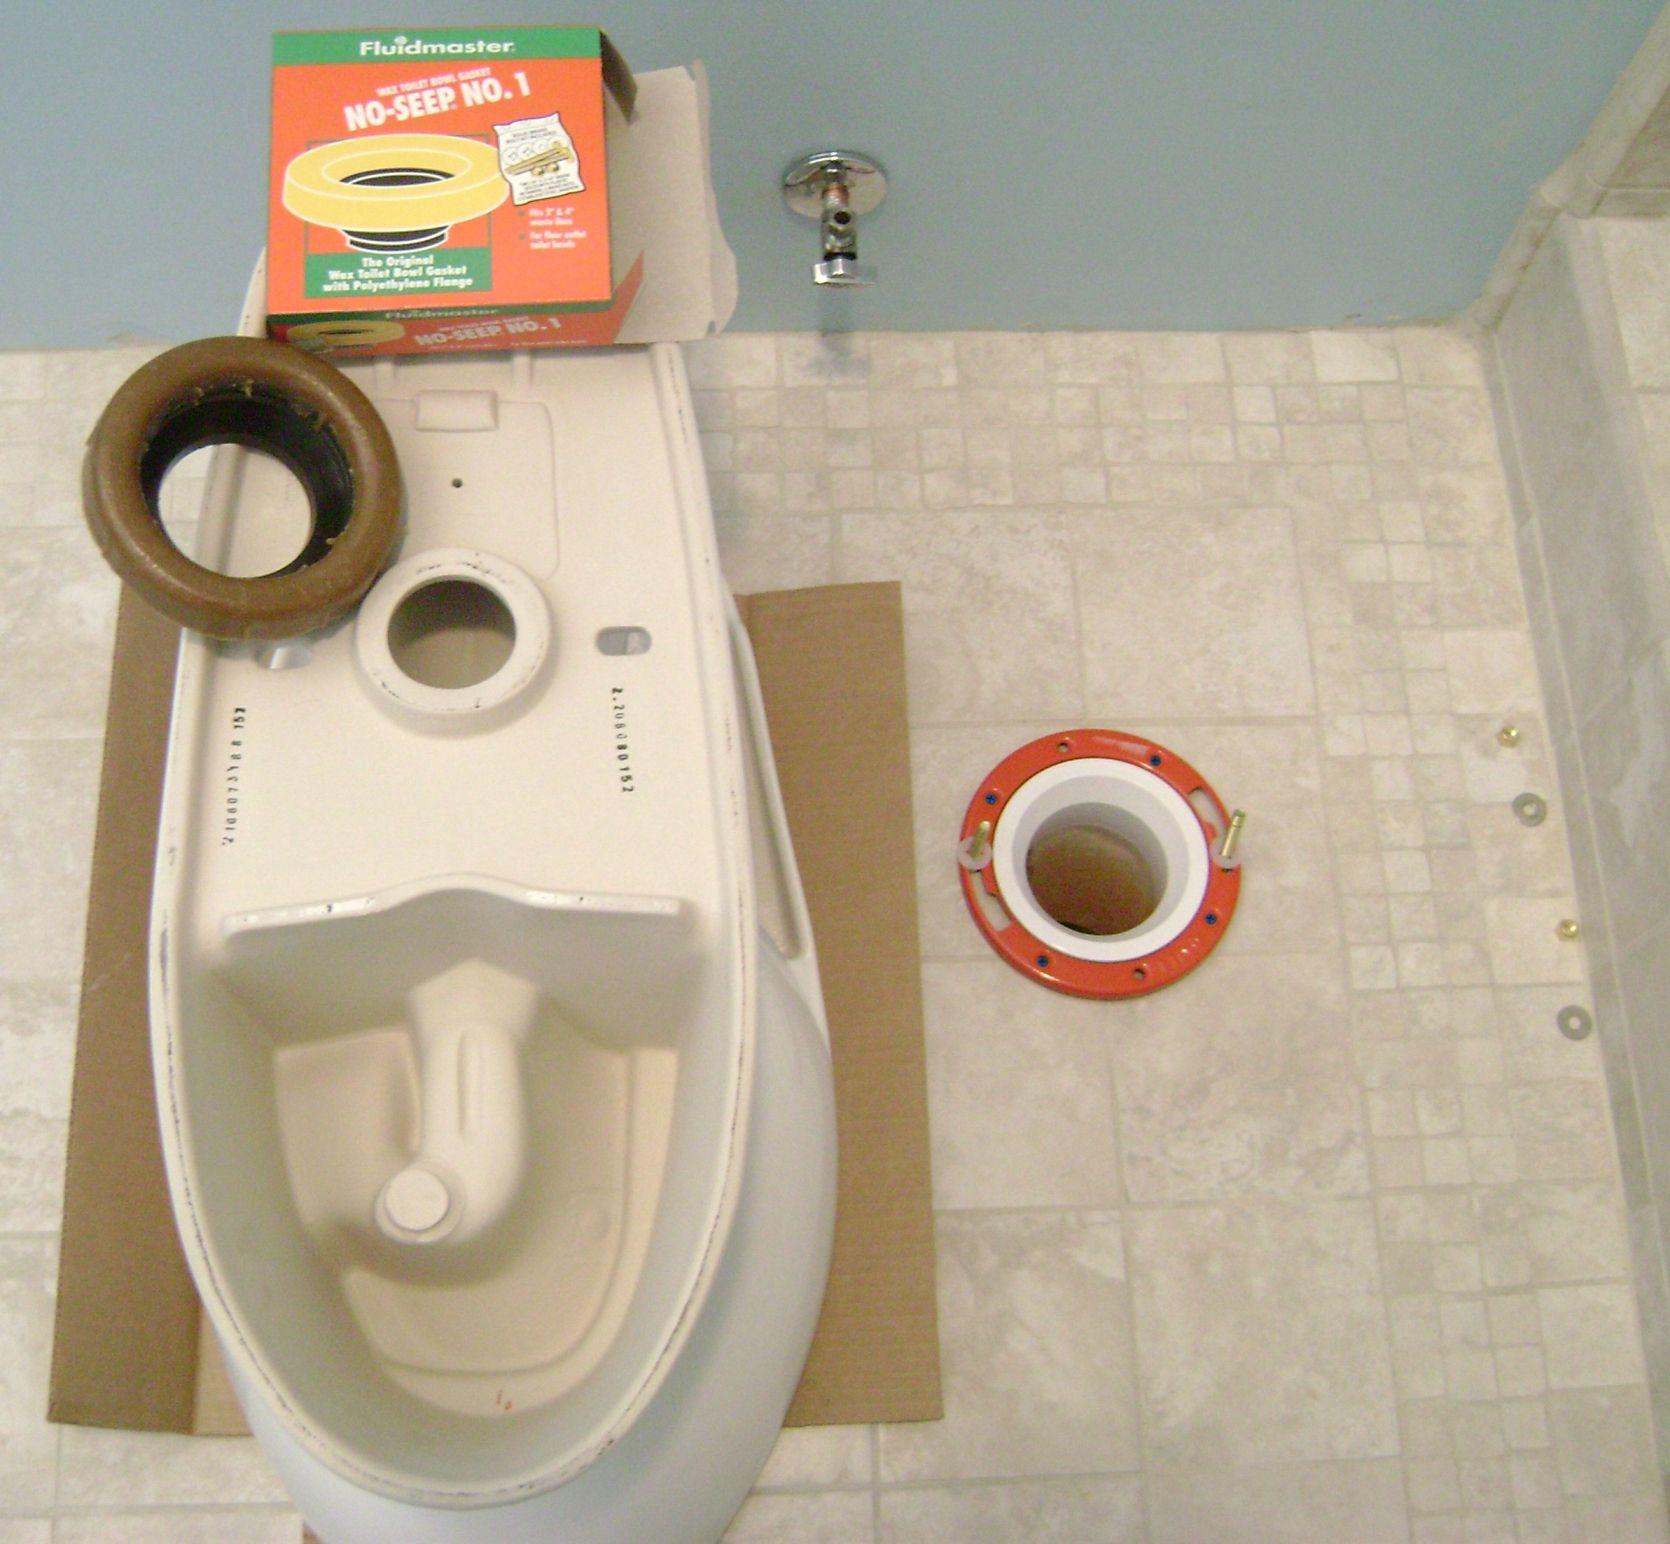 Lighting Basement Washroom Stairs: How To Finish A Basement Bathroom Photo Tutorial. Mount